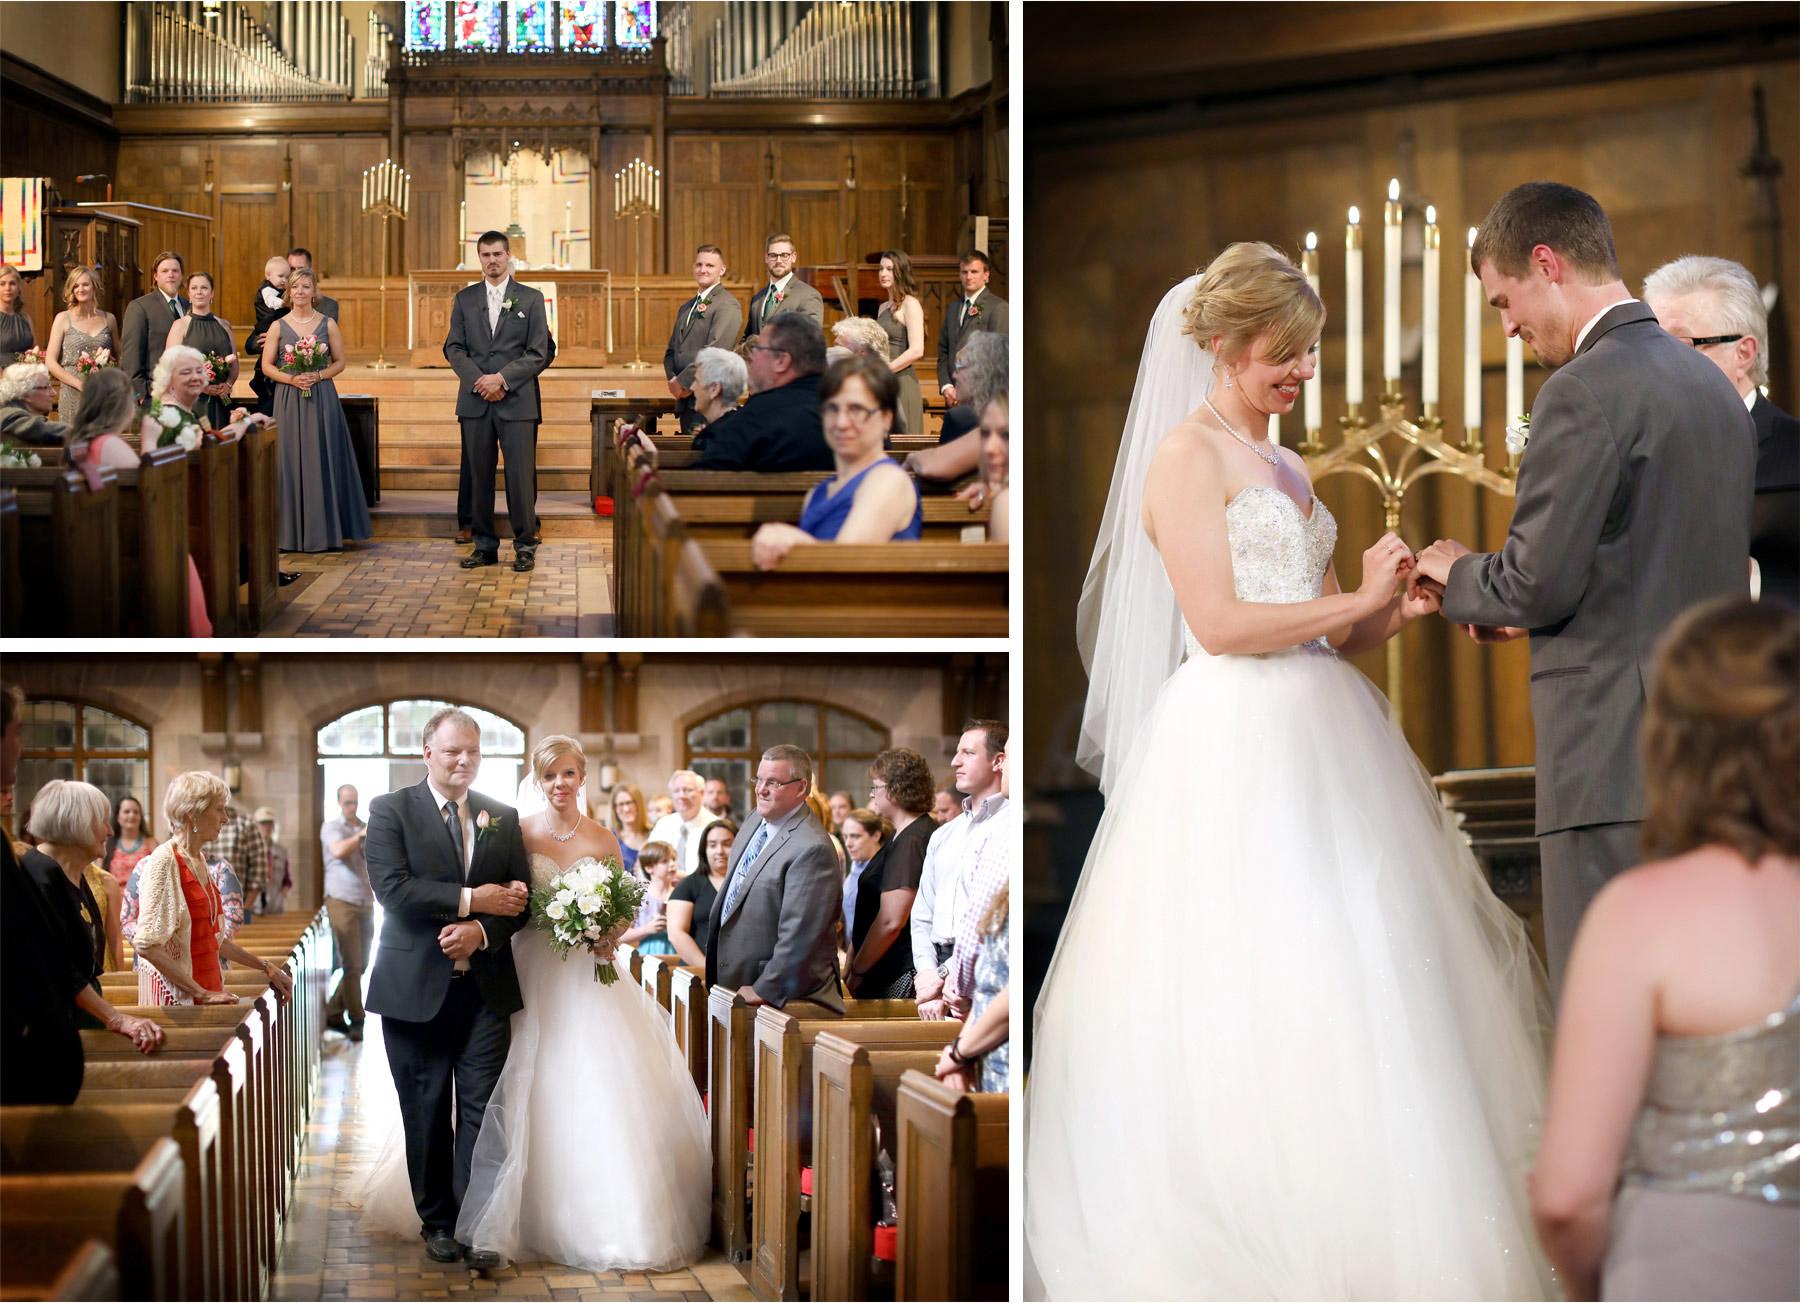 10-Minneapolis-Wedding-Photography-by-Vick-Photography-Hamline-Church-United-Methodist-Ceremony-Kasie-and-Joshua.jpg